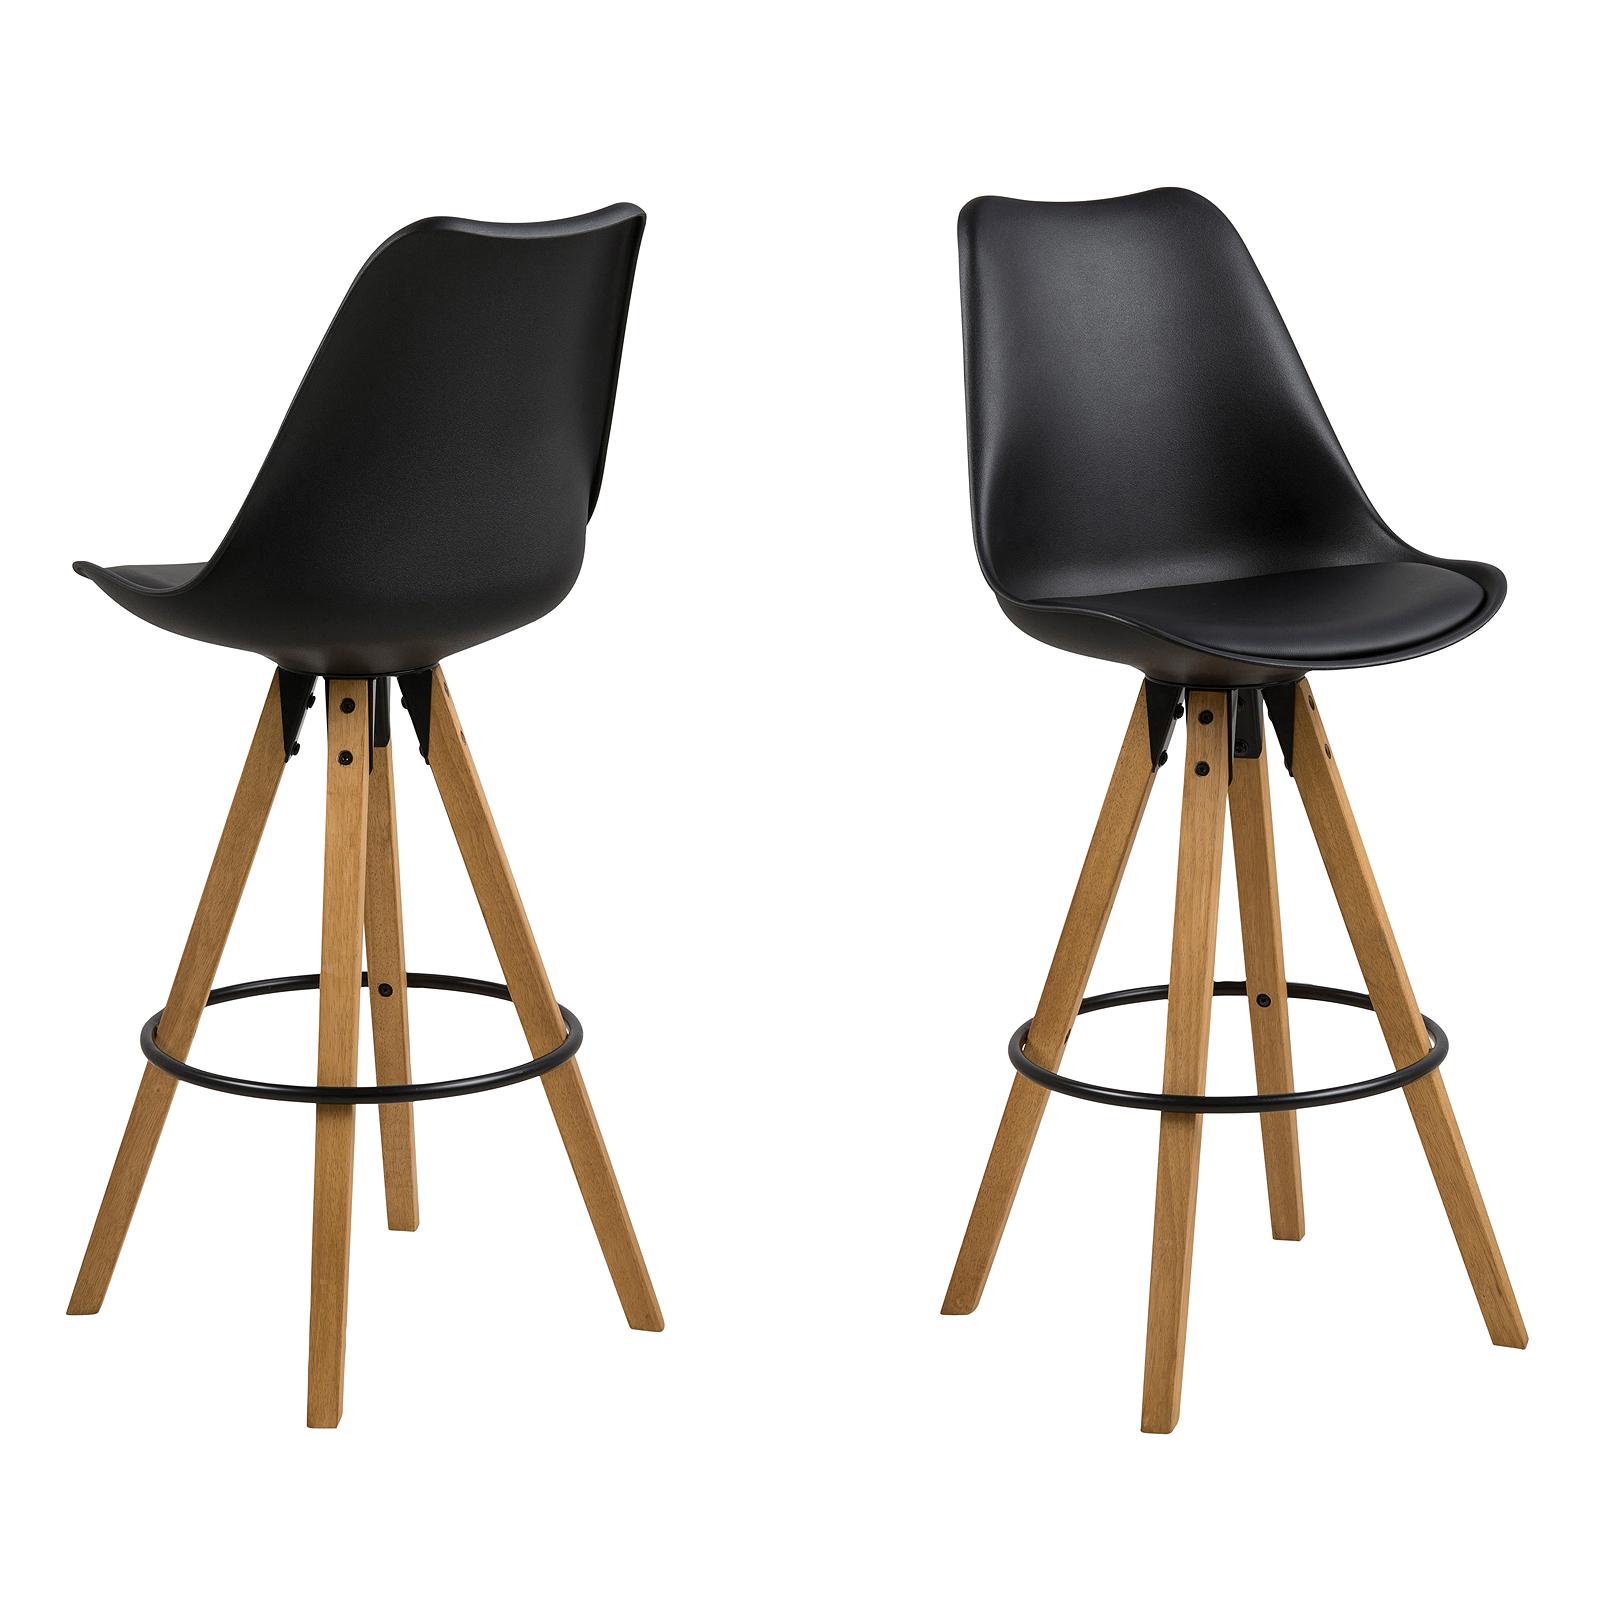 Stuhl dima 2er set esszimmerstuhl barhocker bezug schwarz for Barhocker dima